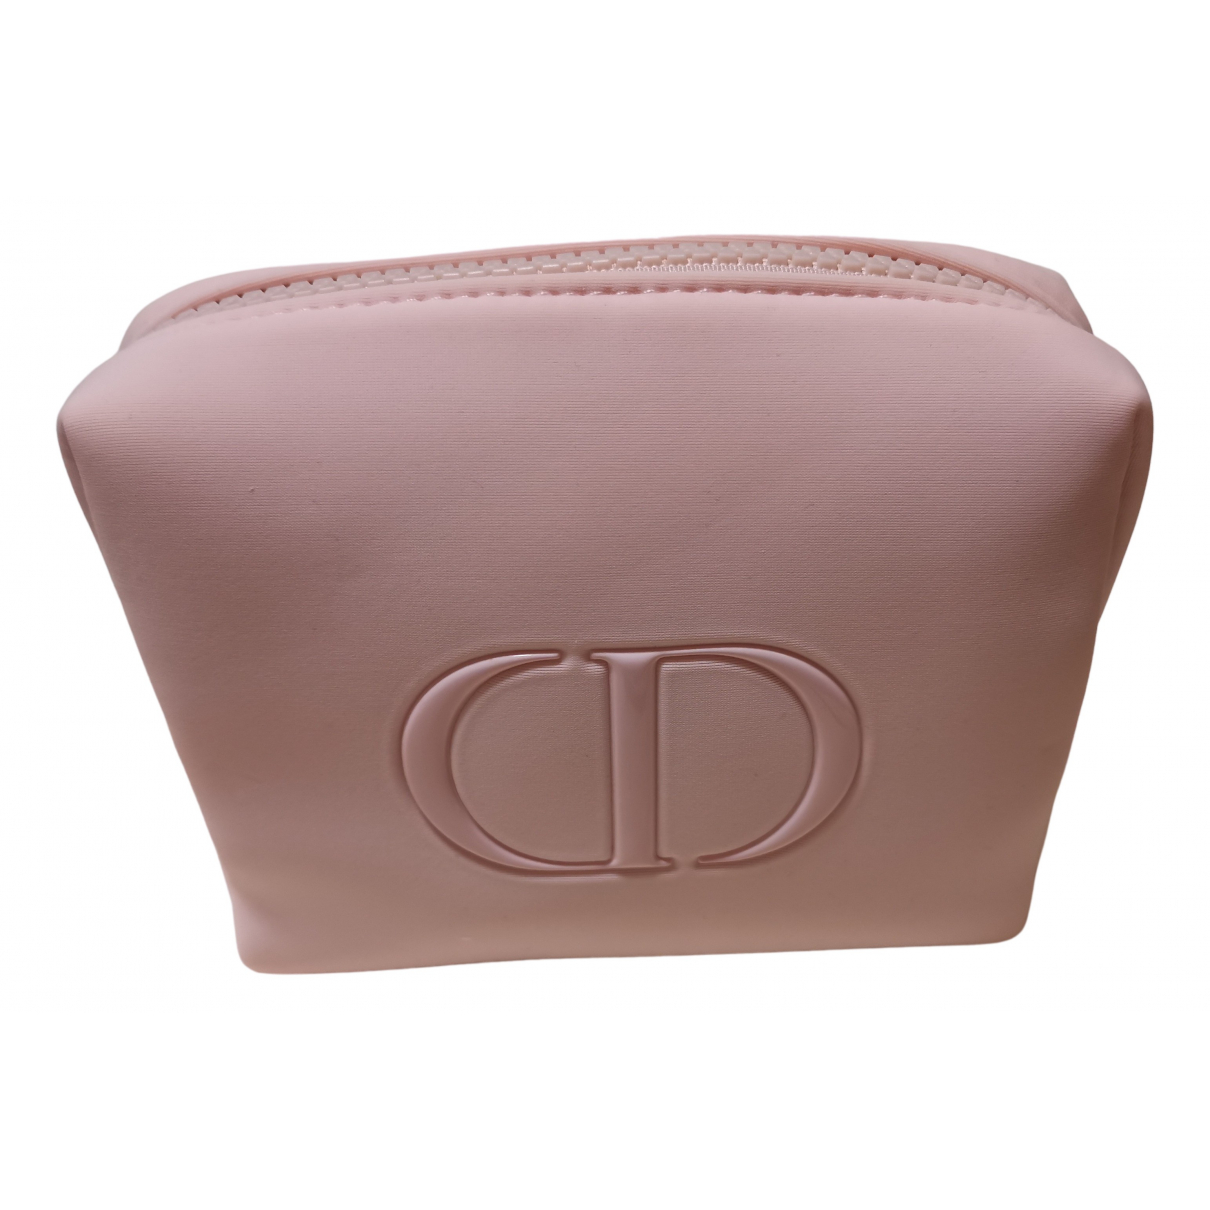 Dior N Pink Travel bag for Women N